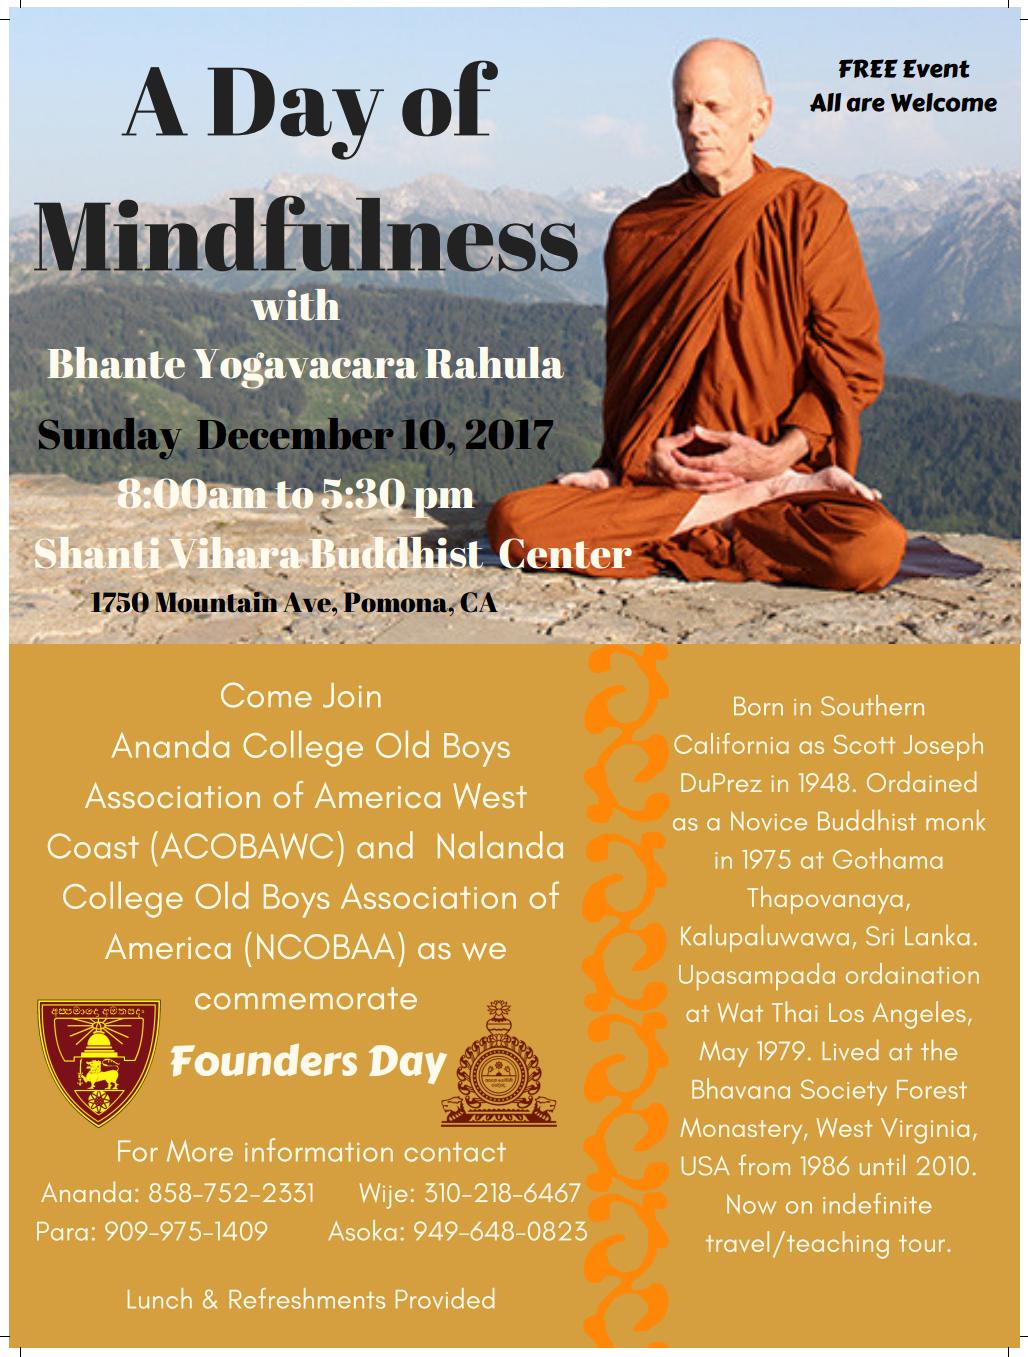 A Day of Mindfulness with Bhante Yogavacara Rahula